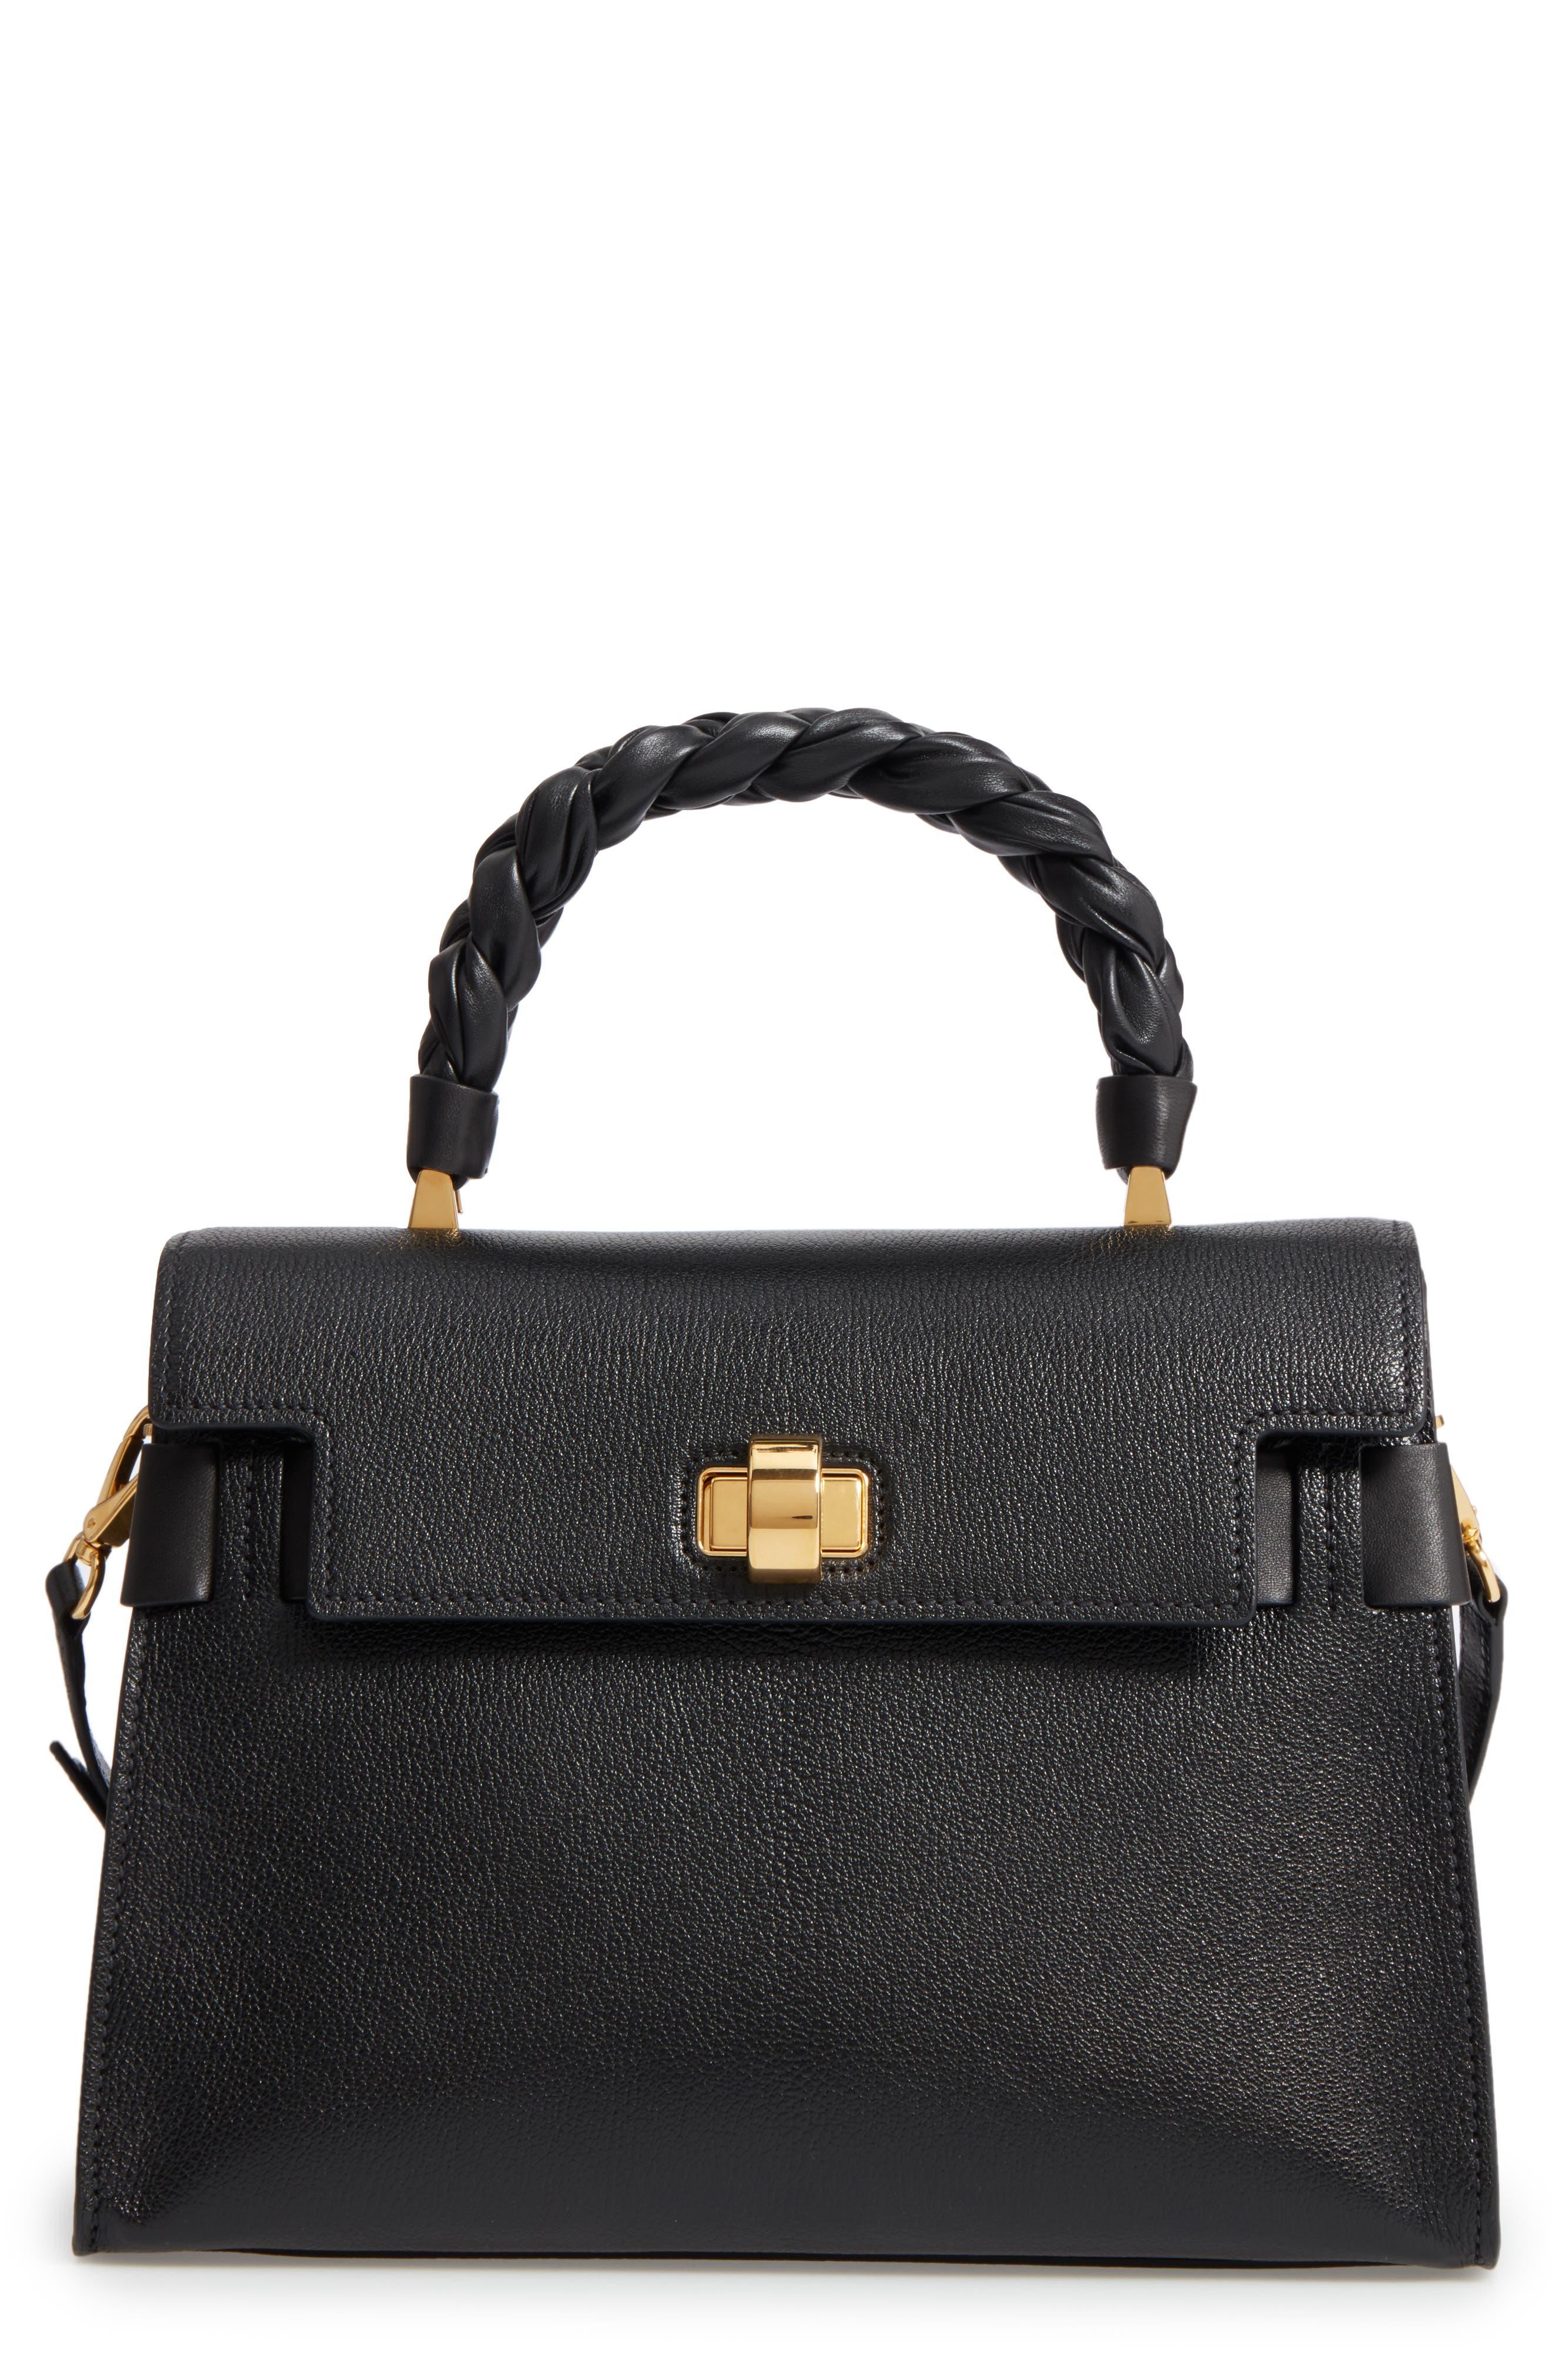 Madras Click Goatskin Leather Satchel,                         Main,                         color, Black